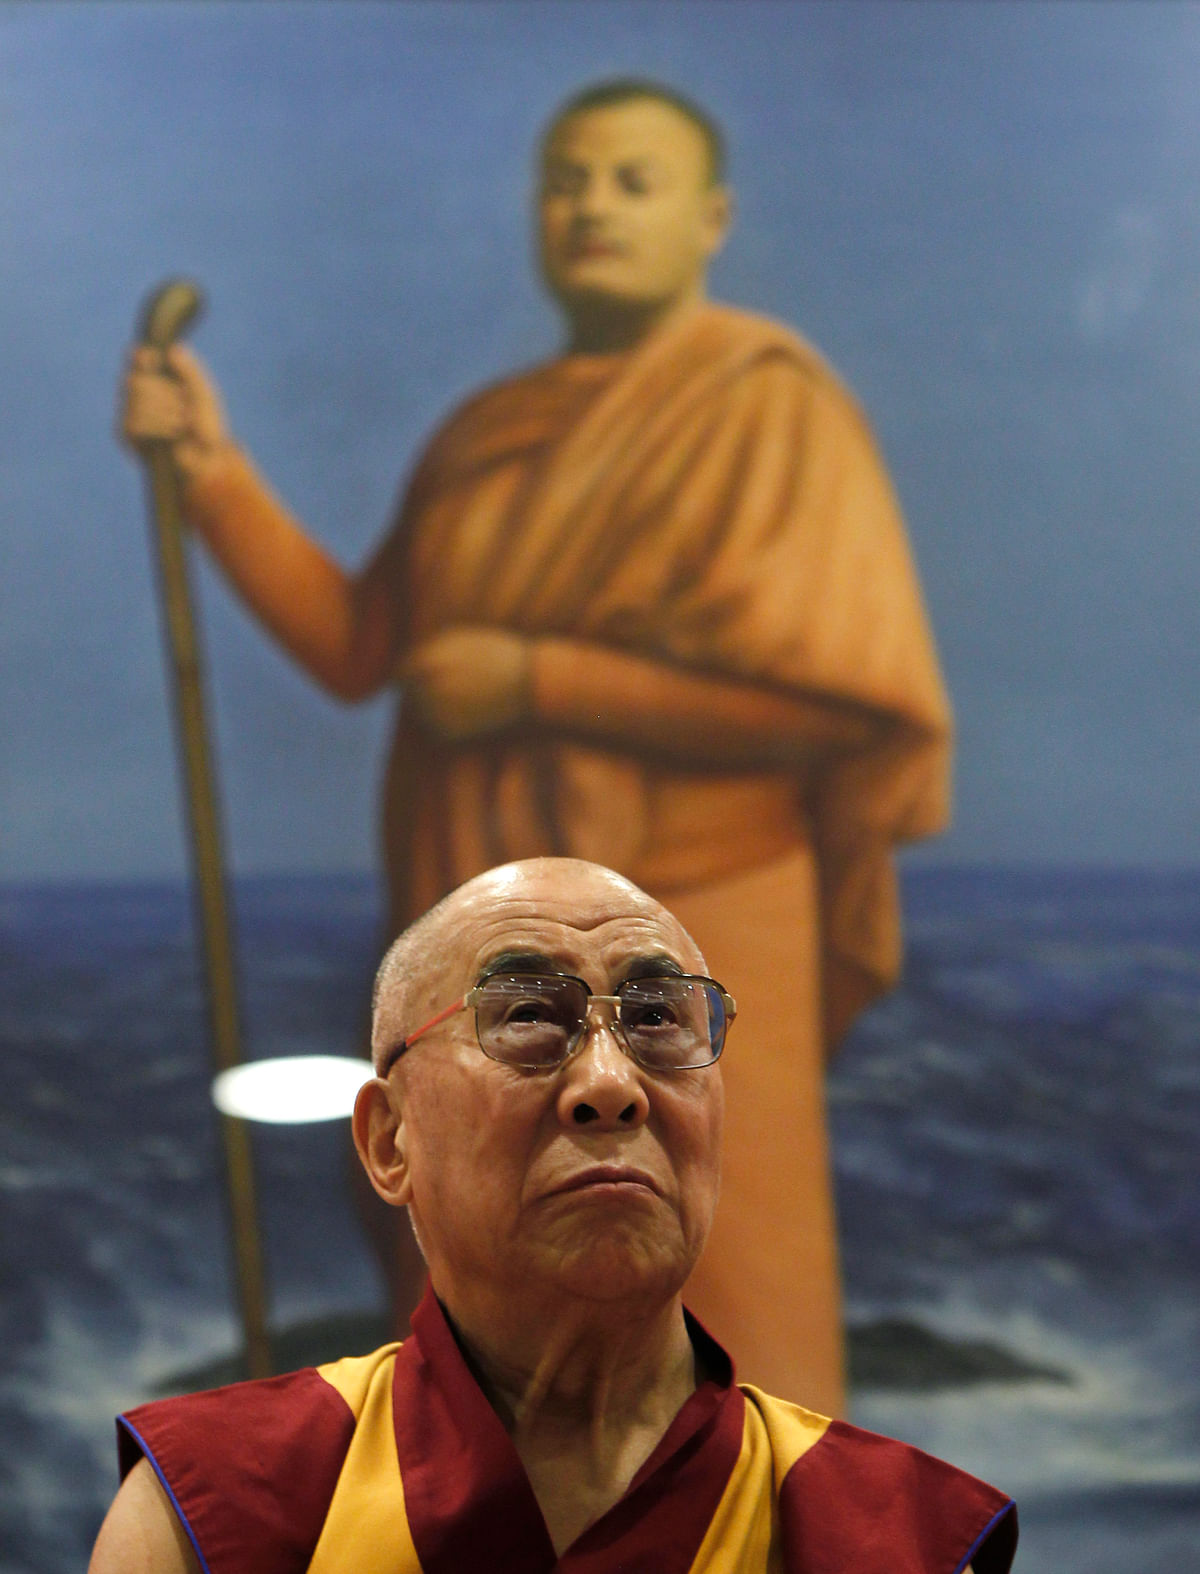 Dalai Lama attends a ceremony marking the birth anniversary celebrations of  Swami Vivekananda in New Delhi September 11, 2012. (Photo: Reuters)